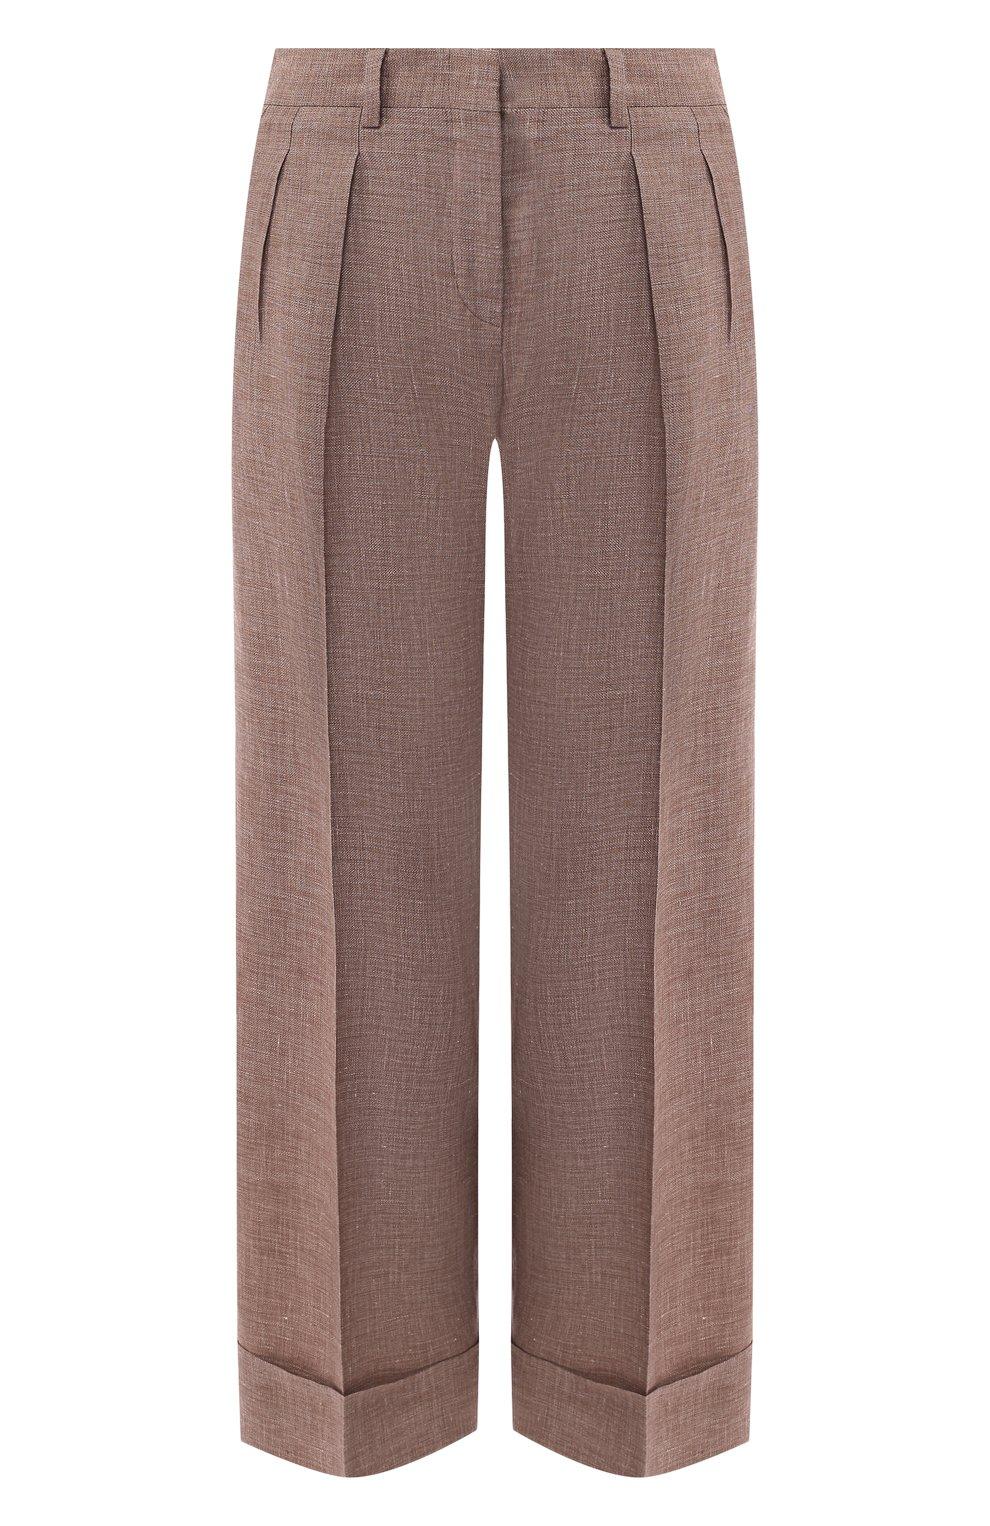 Женские брюки с отворотами KITON коричневого цвета, арт. D47119K06P19 | Фото 1